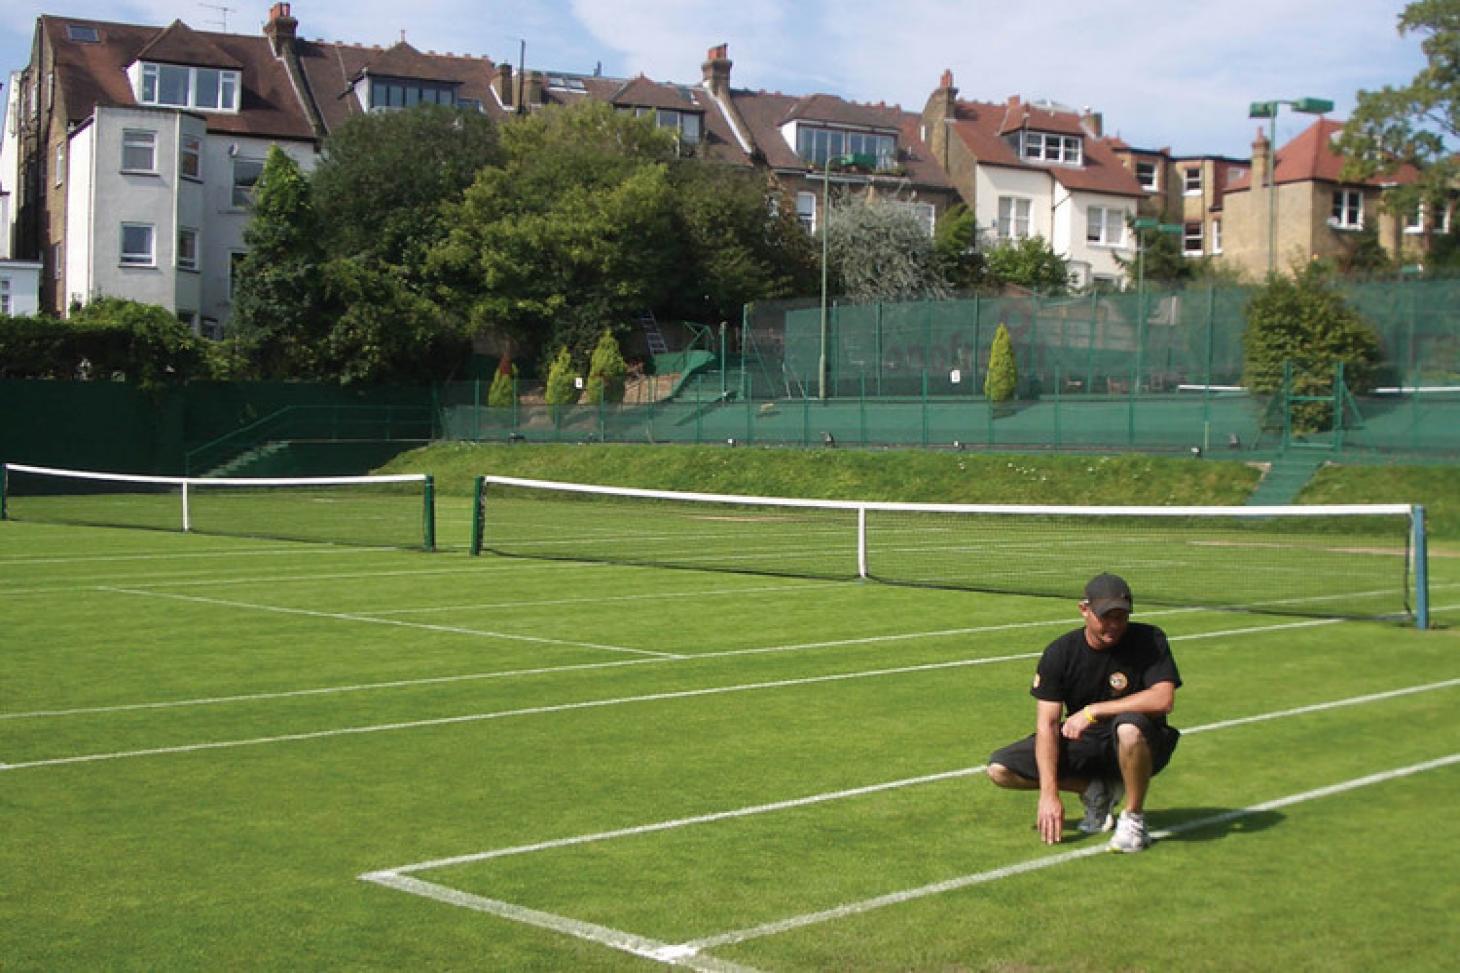 South Hampstead Lawn Tennis Club Outdoor | Hard (macadam) tennis court